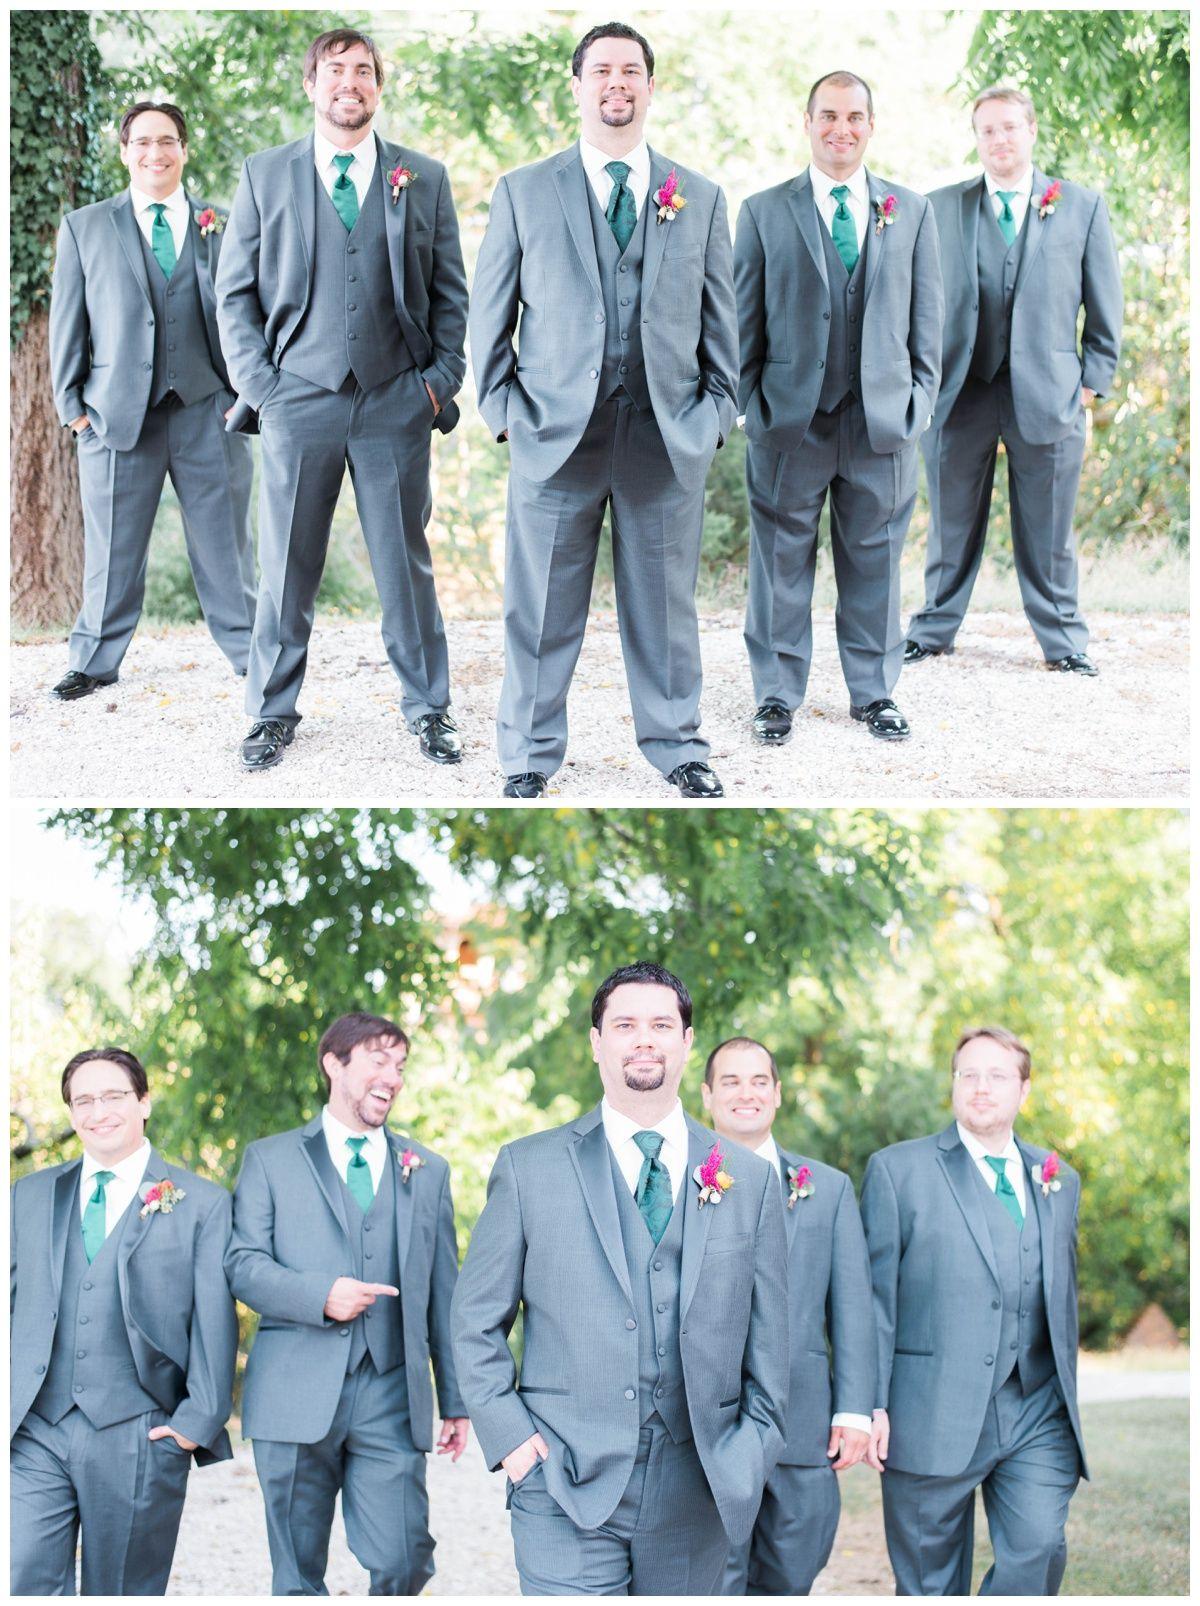 historic london town & garden wedding; colorful wedding; groom ...